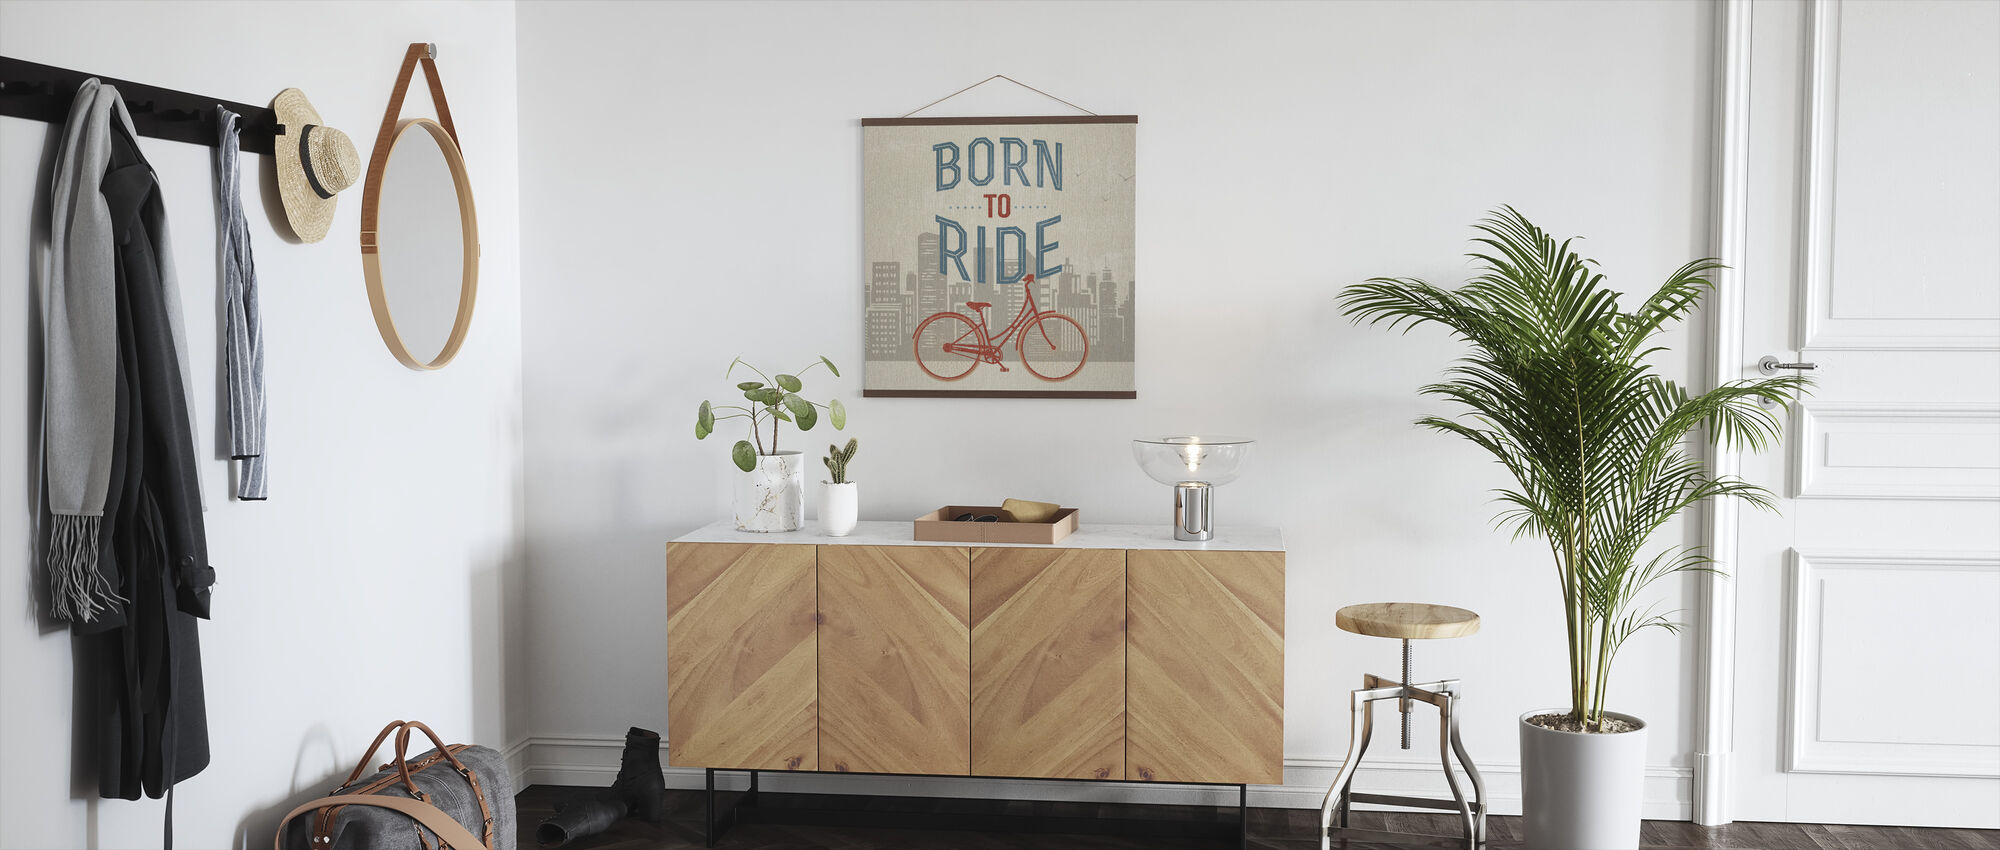 Born to Ride - Poster - Hallway